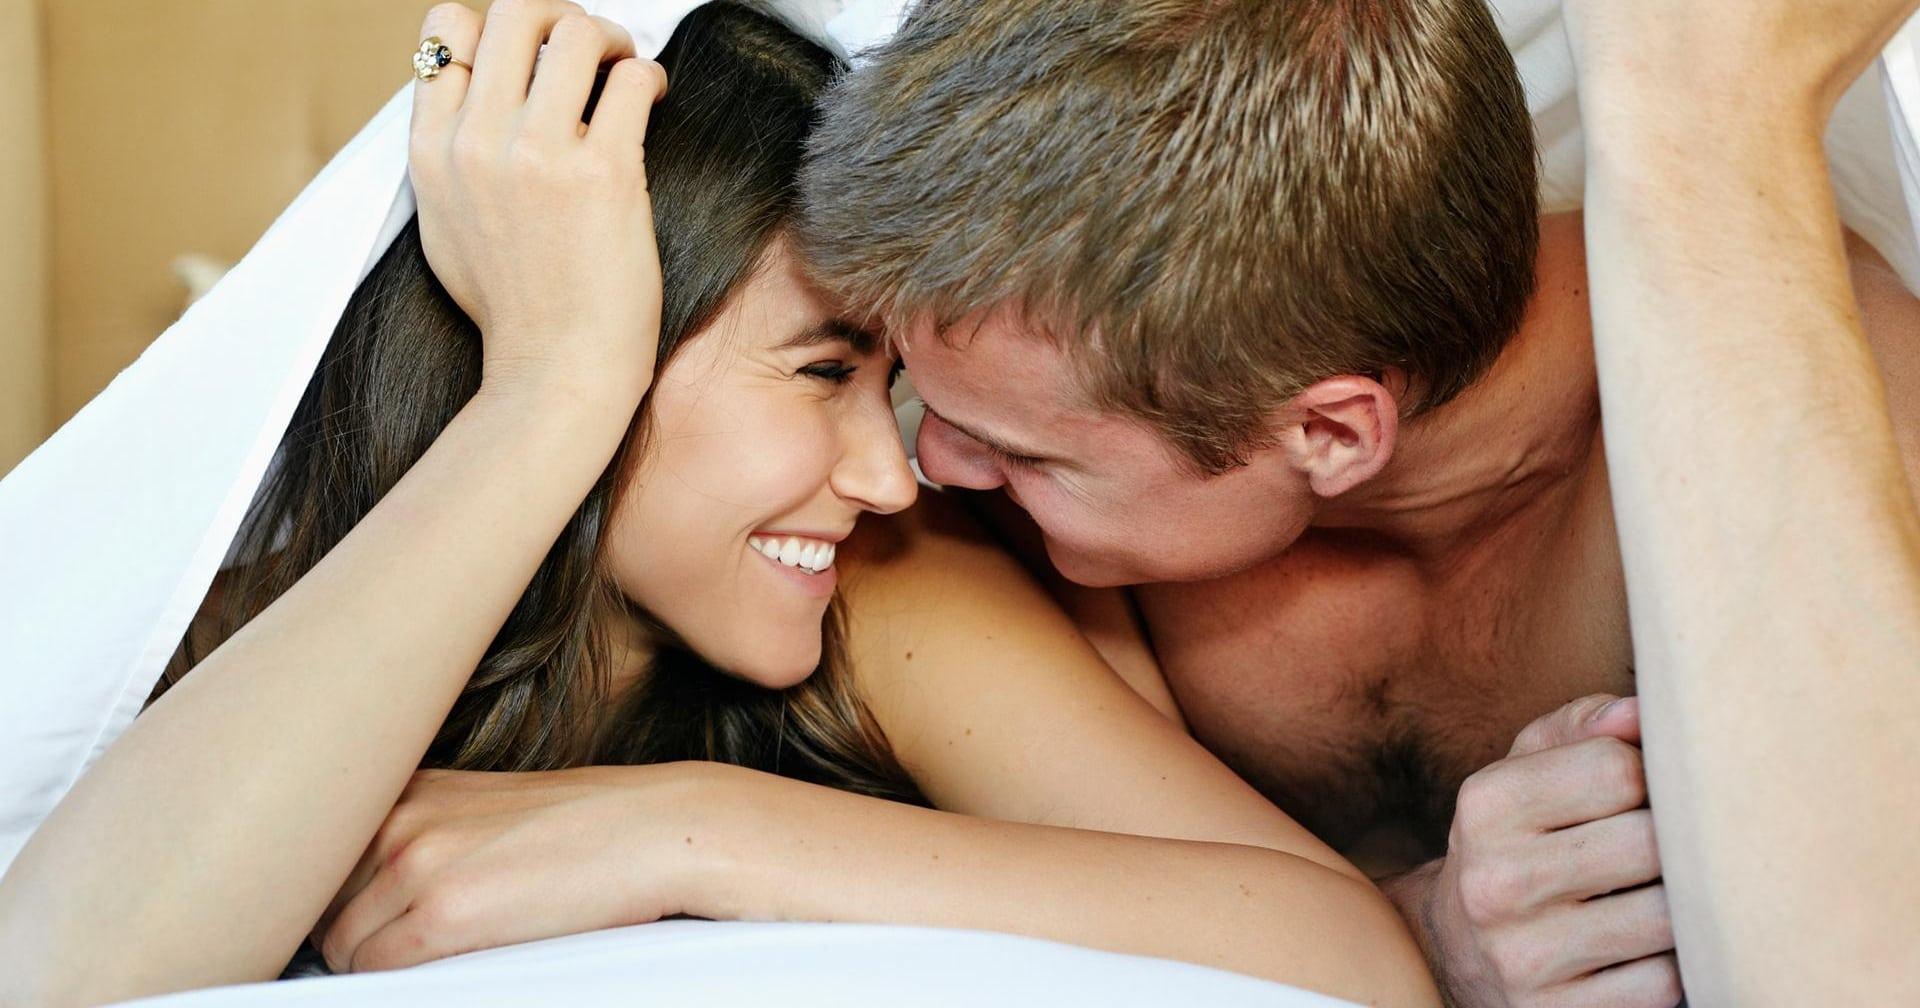 секс с девушкой после знакомства за и против